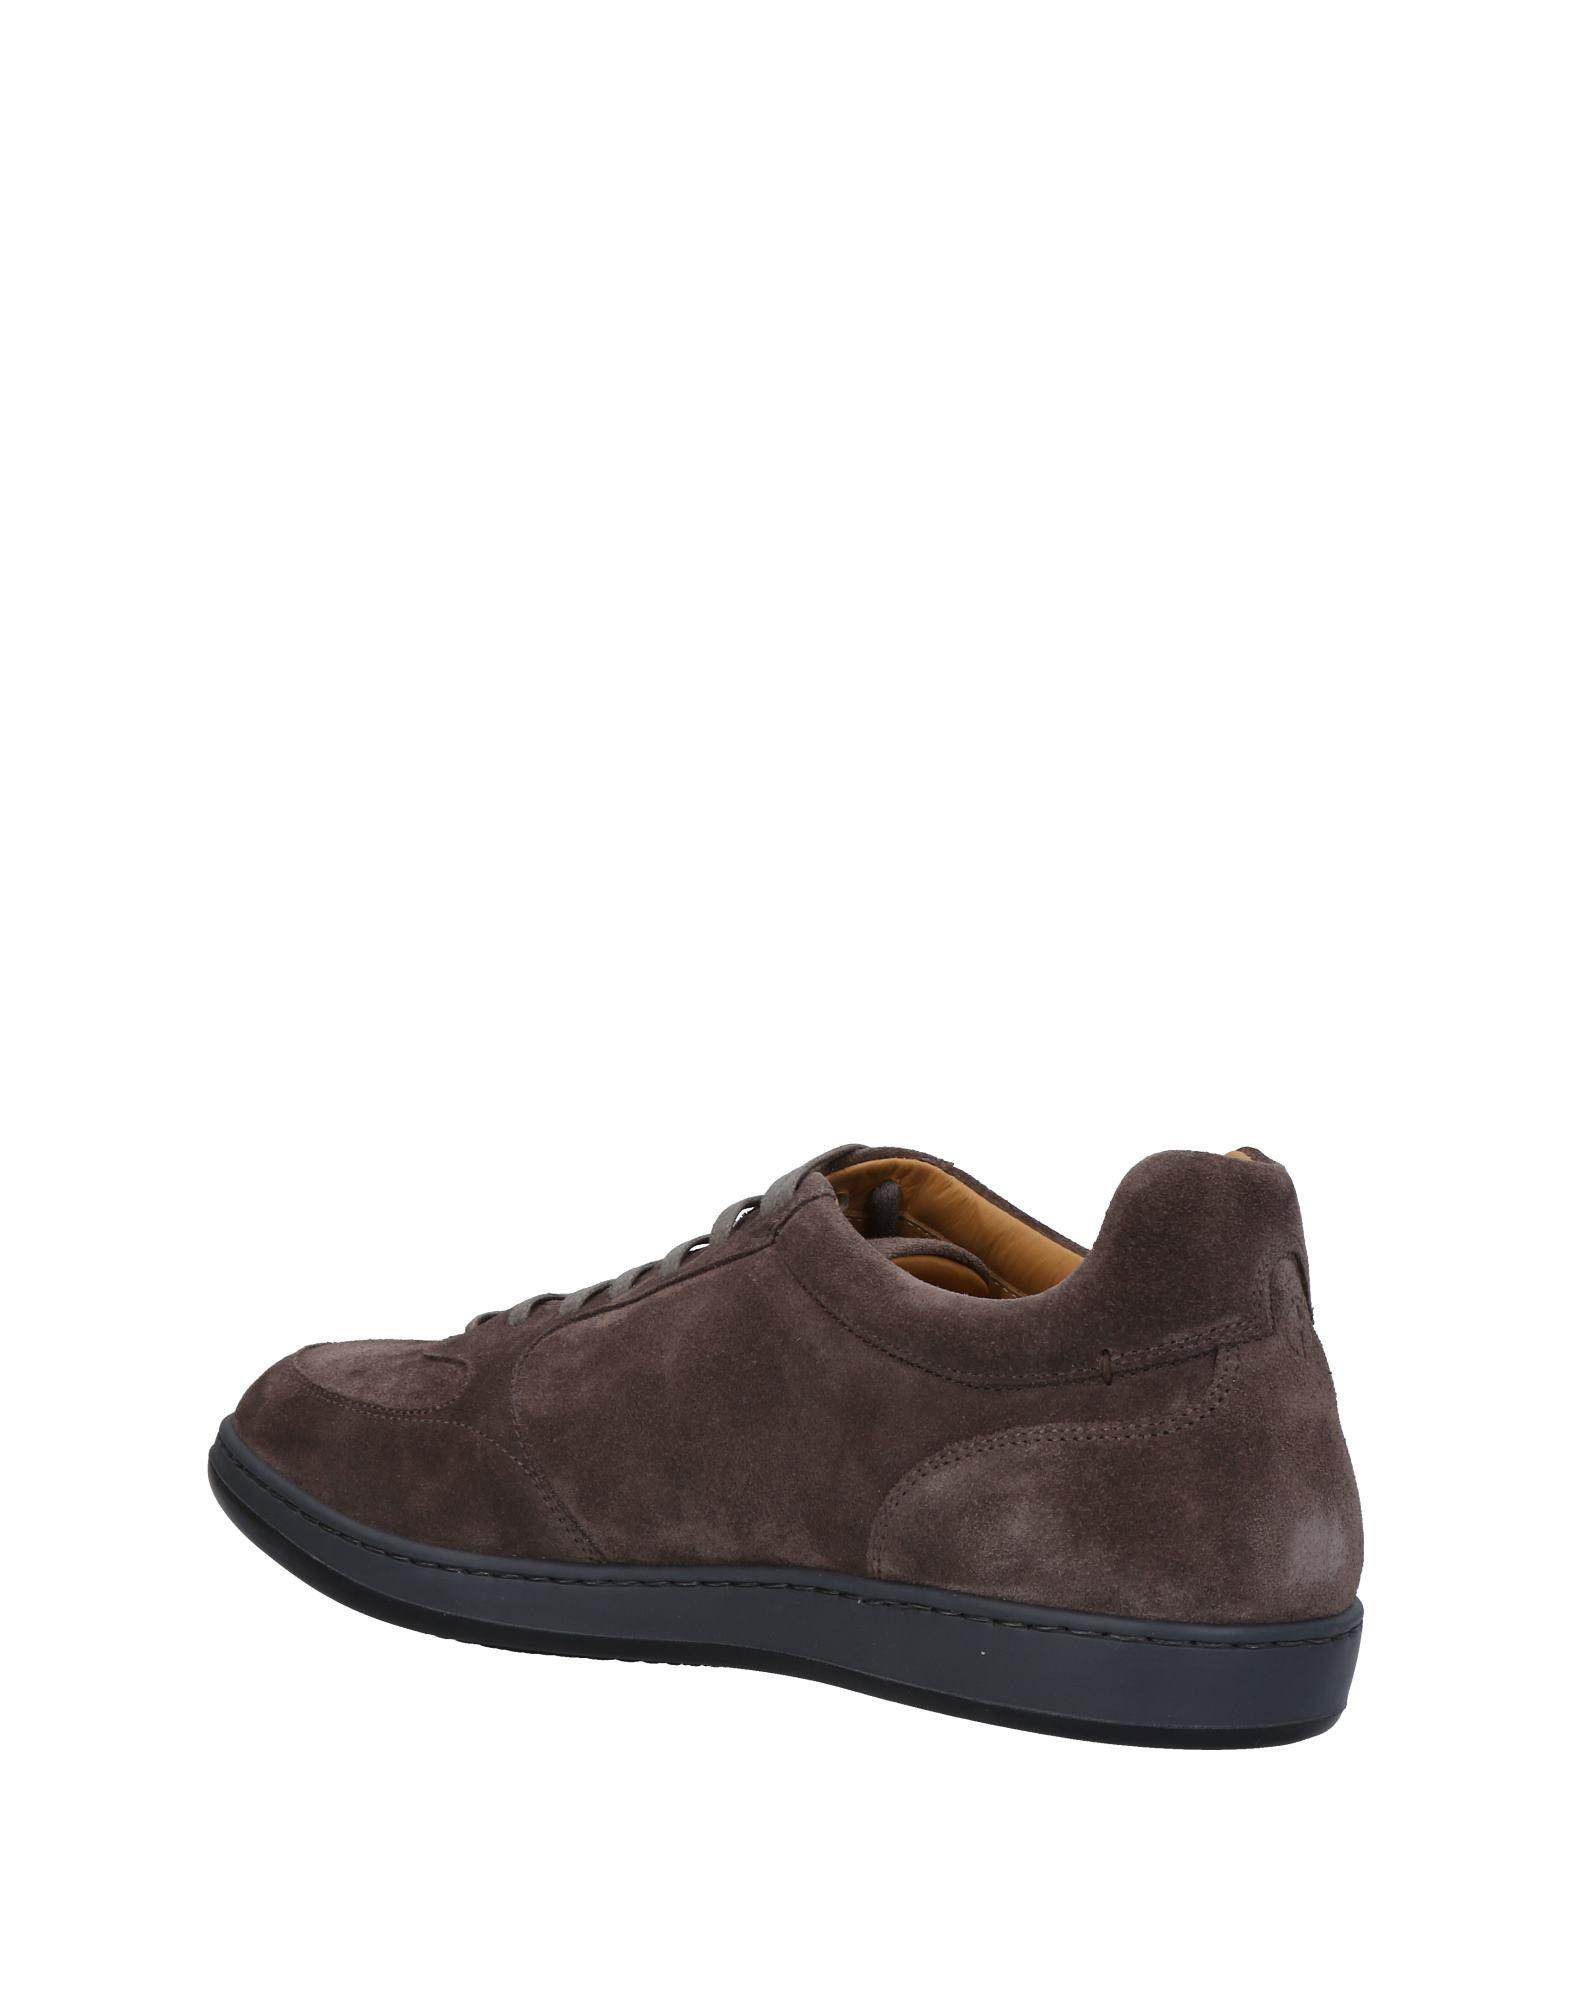 Giorgio Armani 11430440AX Sneakers Herren  11430440AX Armani 450083